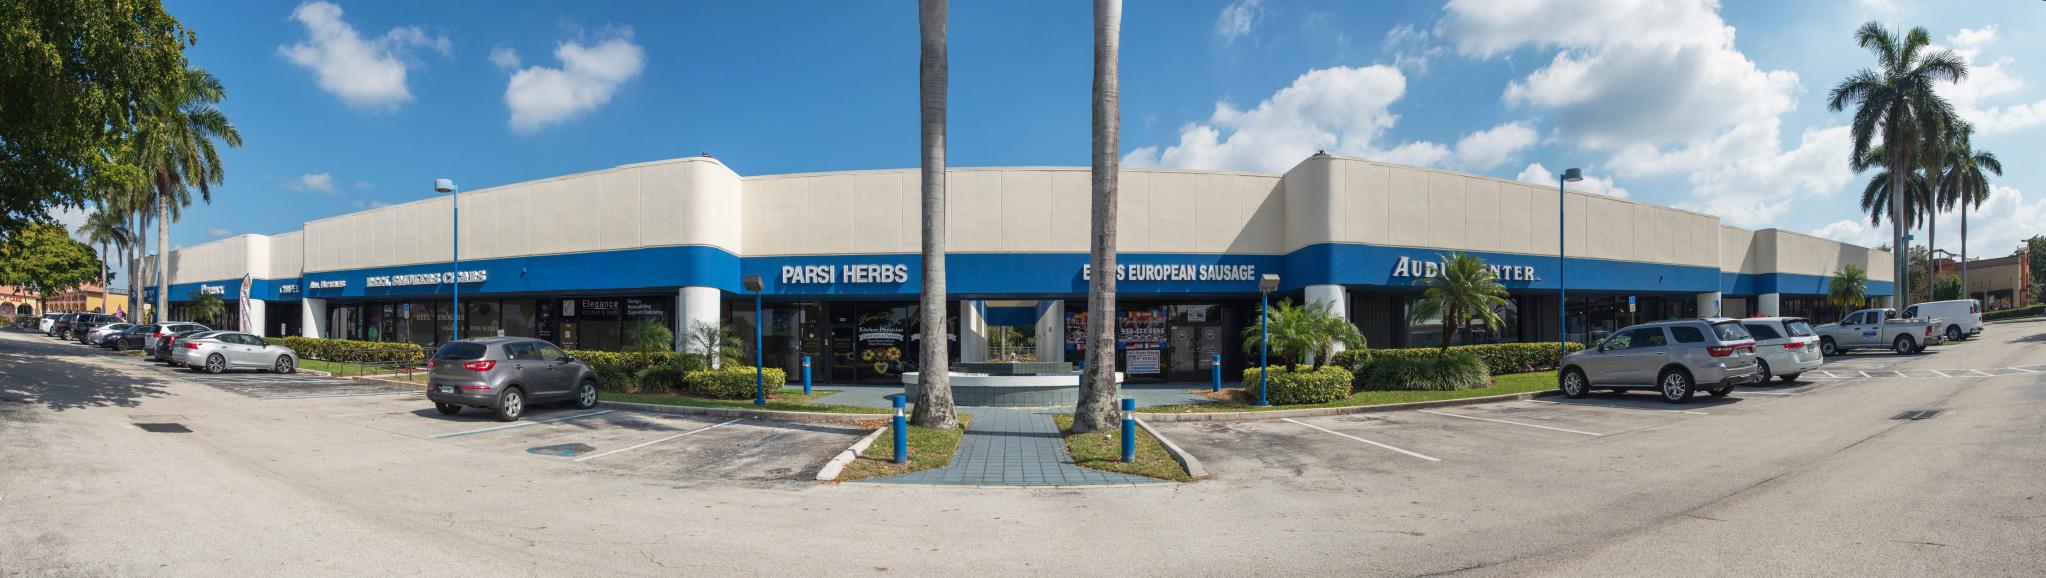 BuenaVista Plaza copy